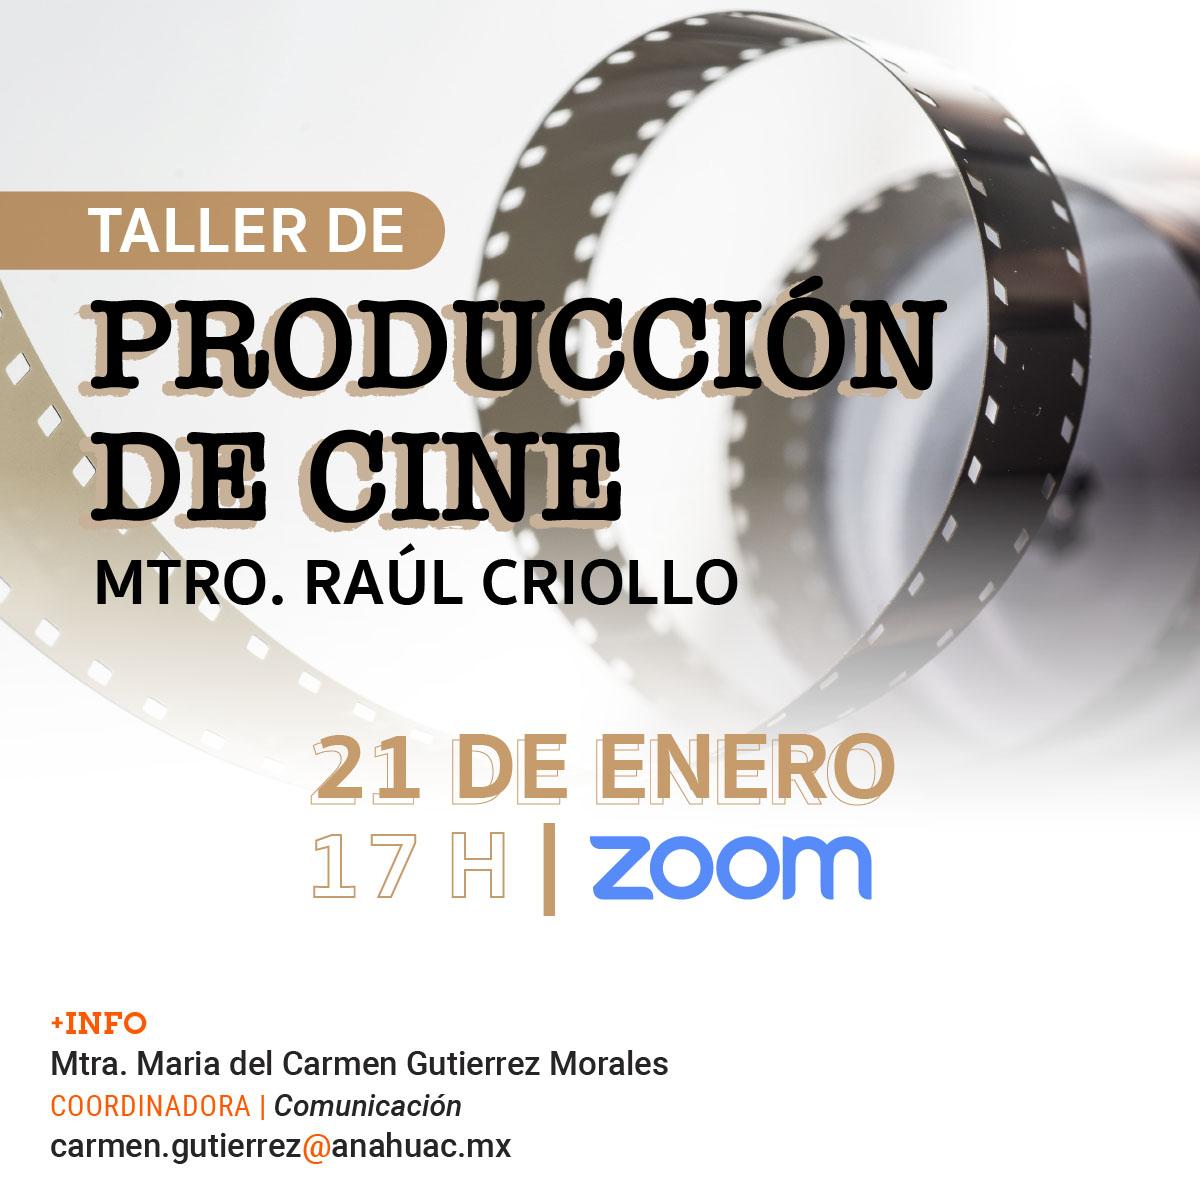 Taller de Producción de Cine